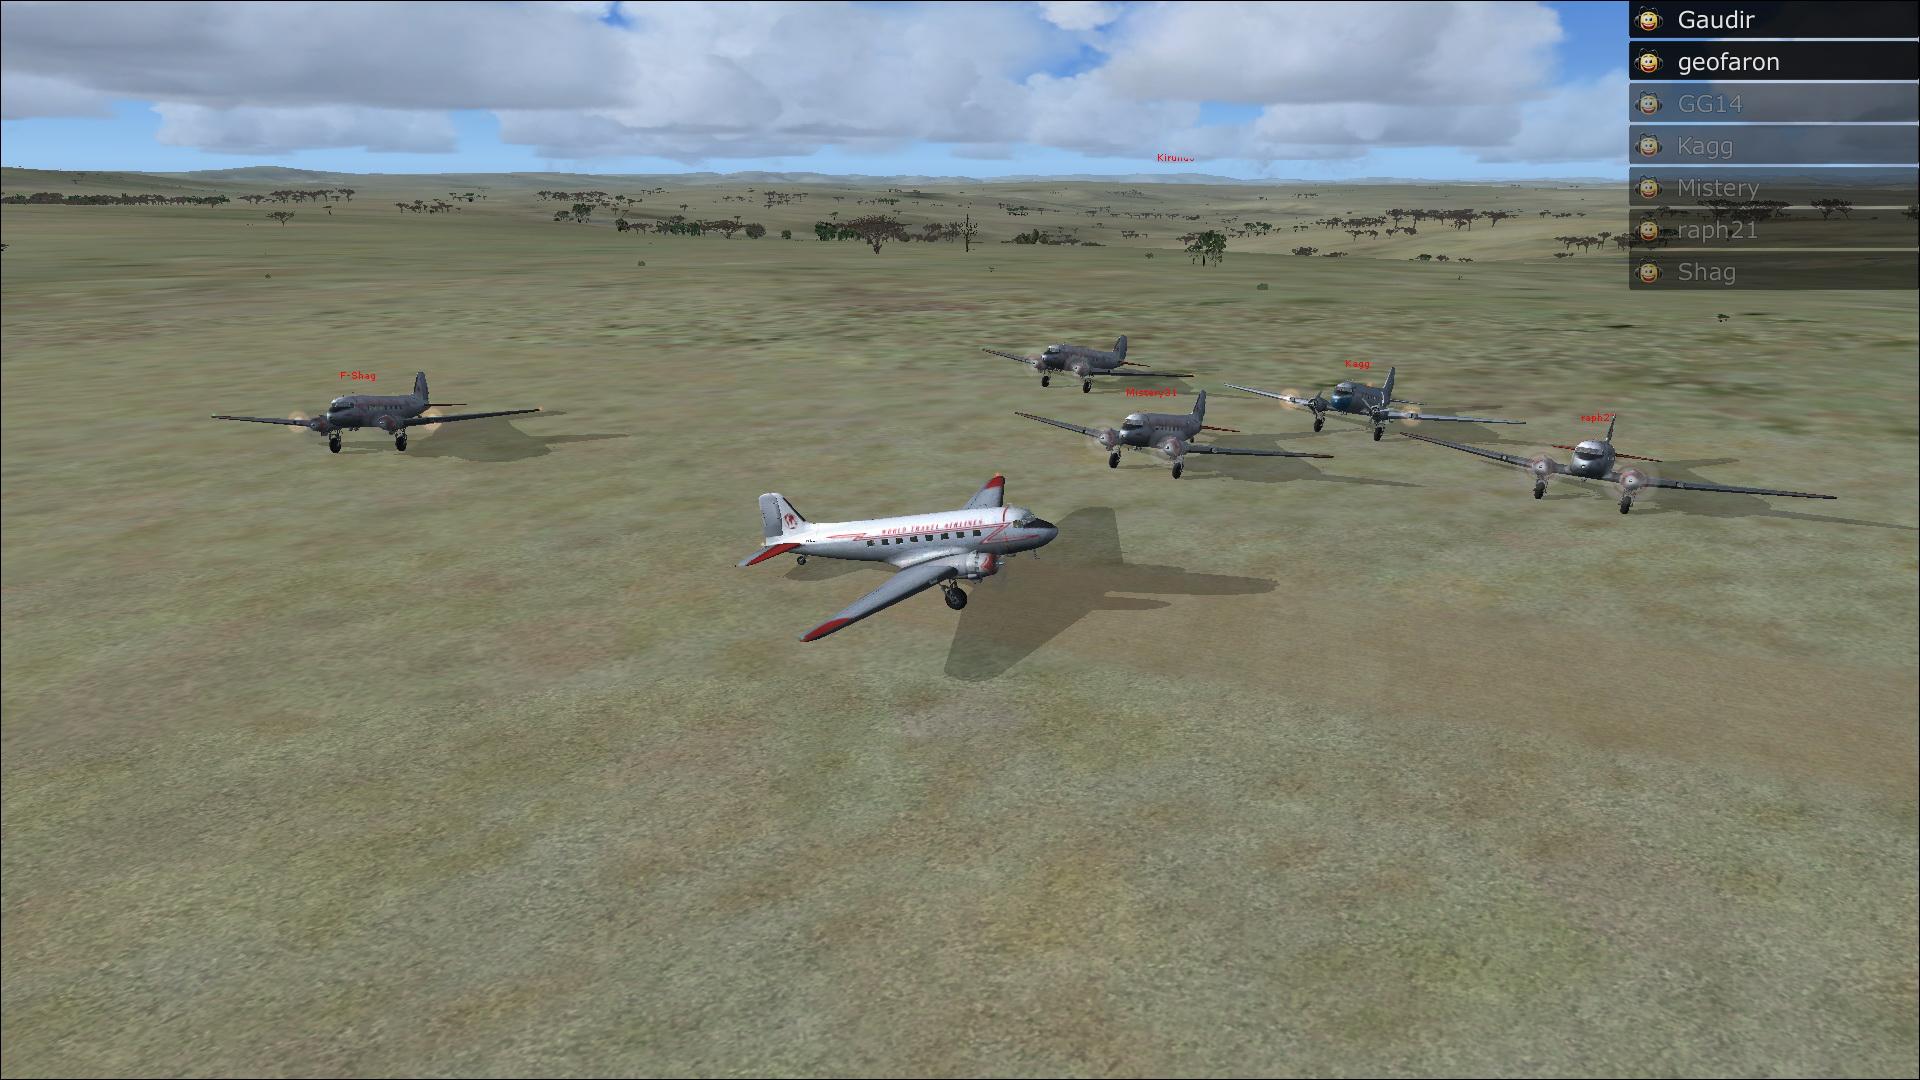 Vol en formation en Afrique (DC3) 9204982013222213250644